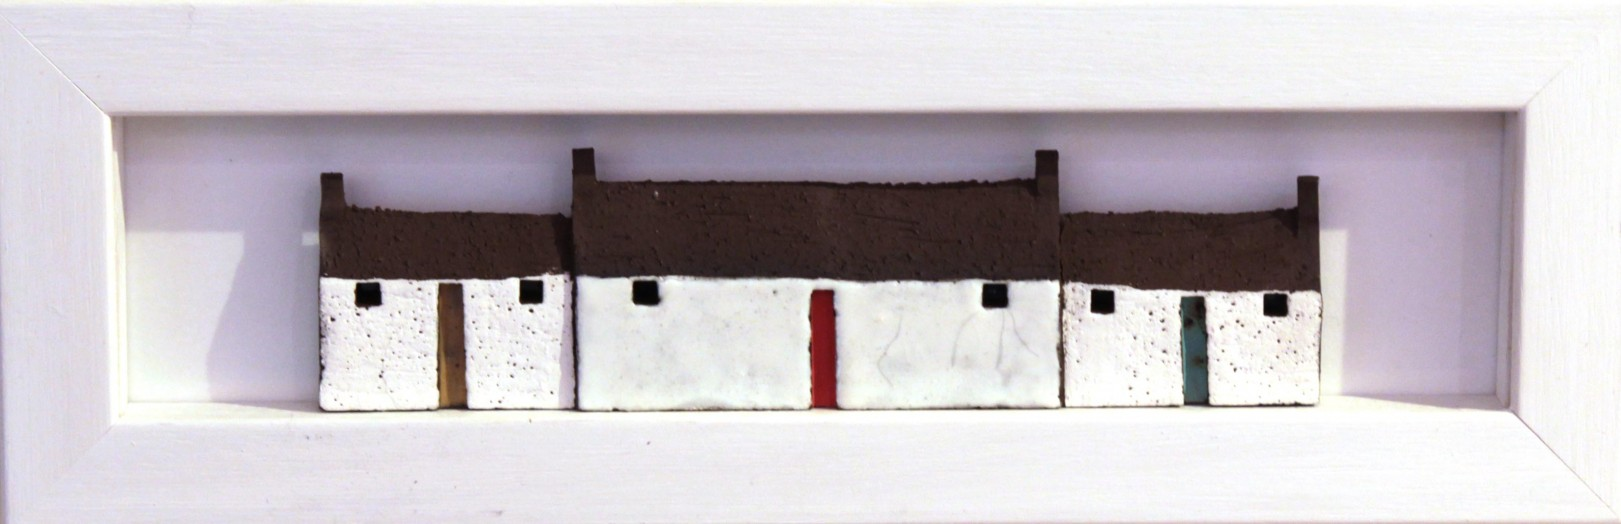 Pauline Montgomery_Original_Ceramics_Wee Houses Framed_4x12_185